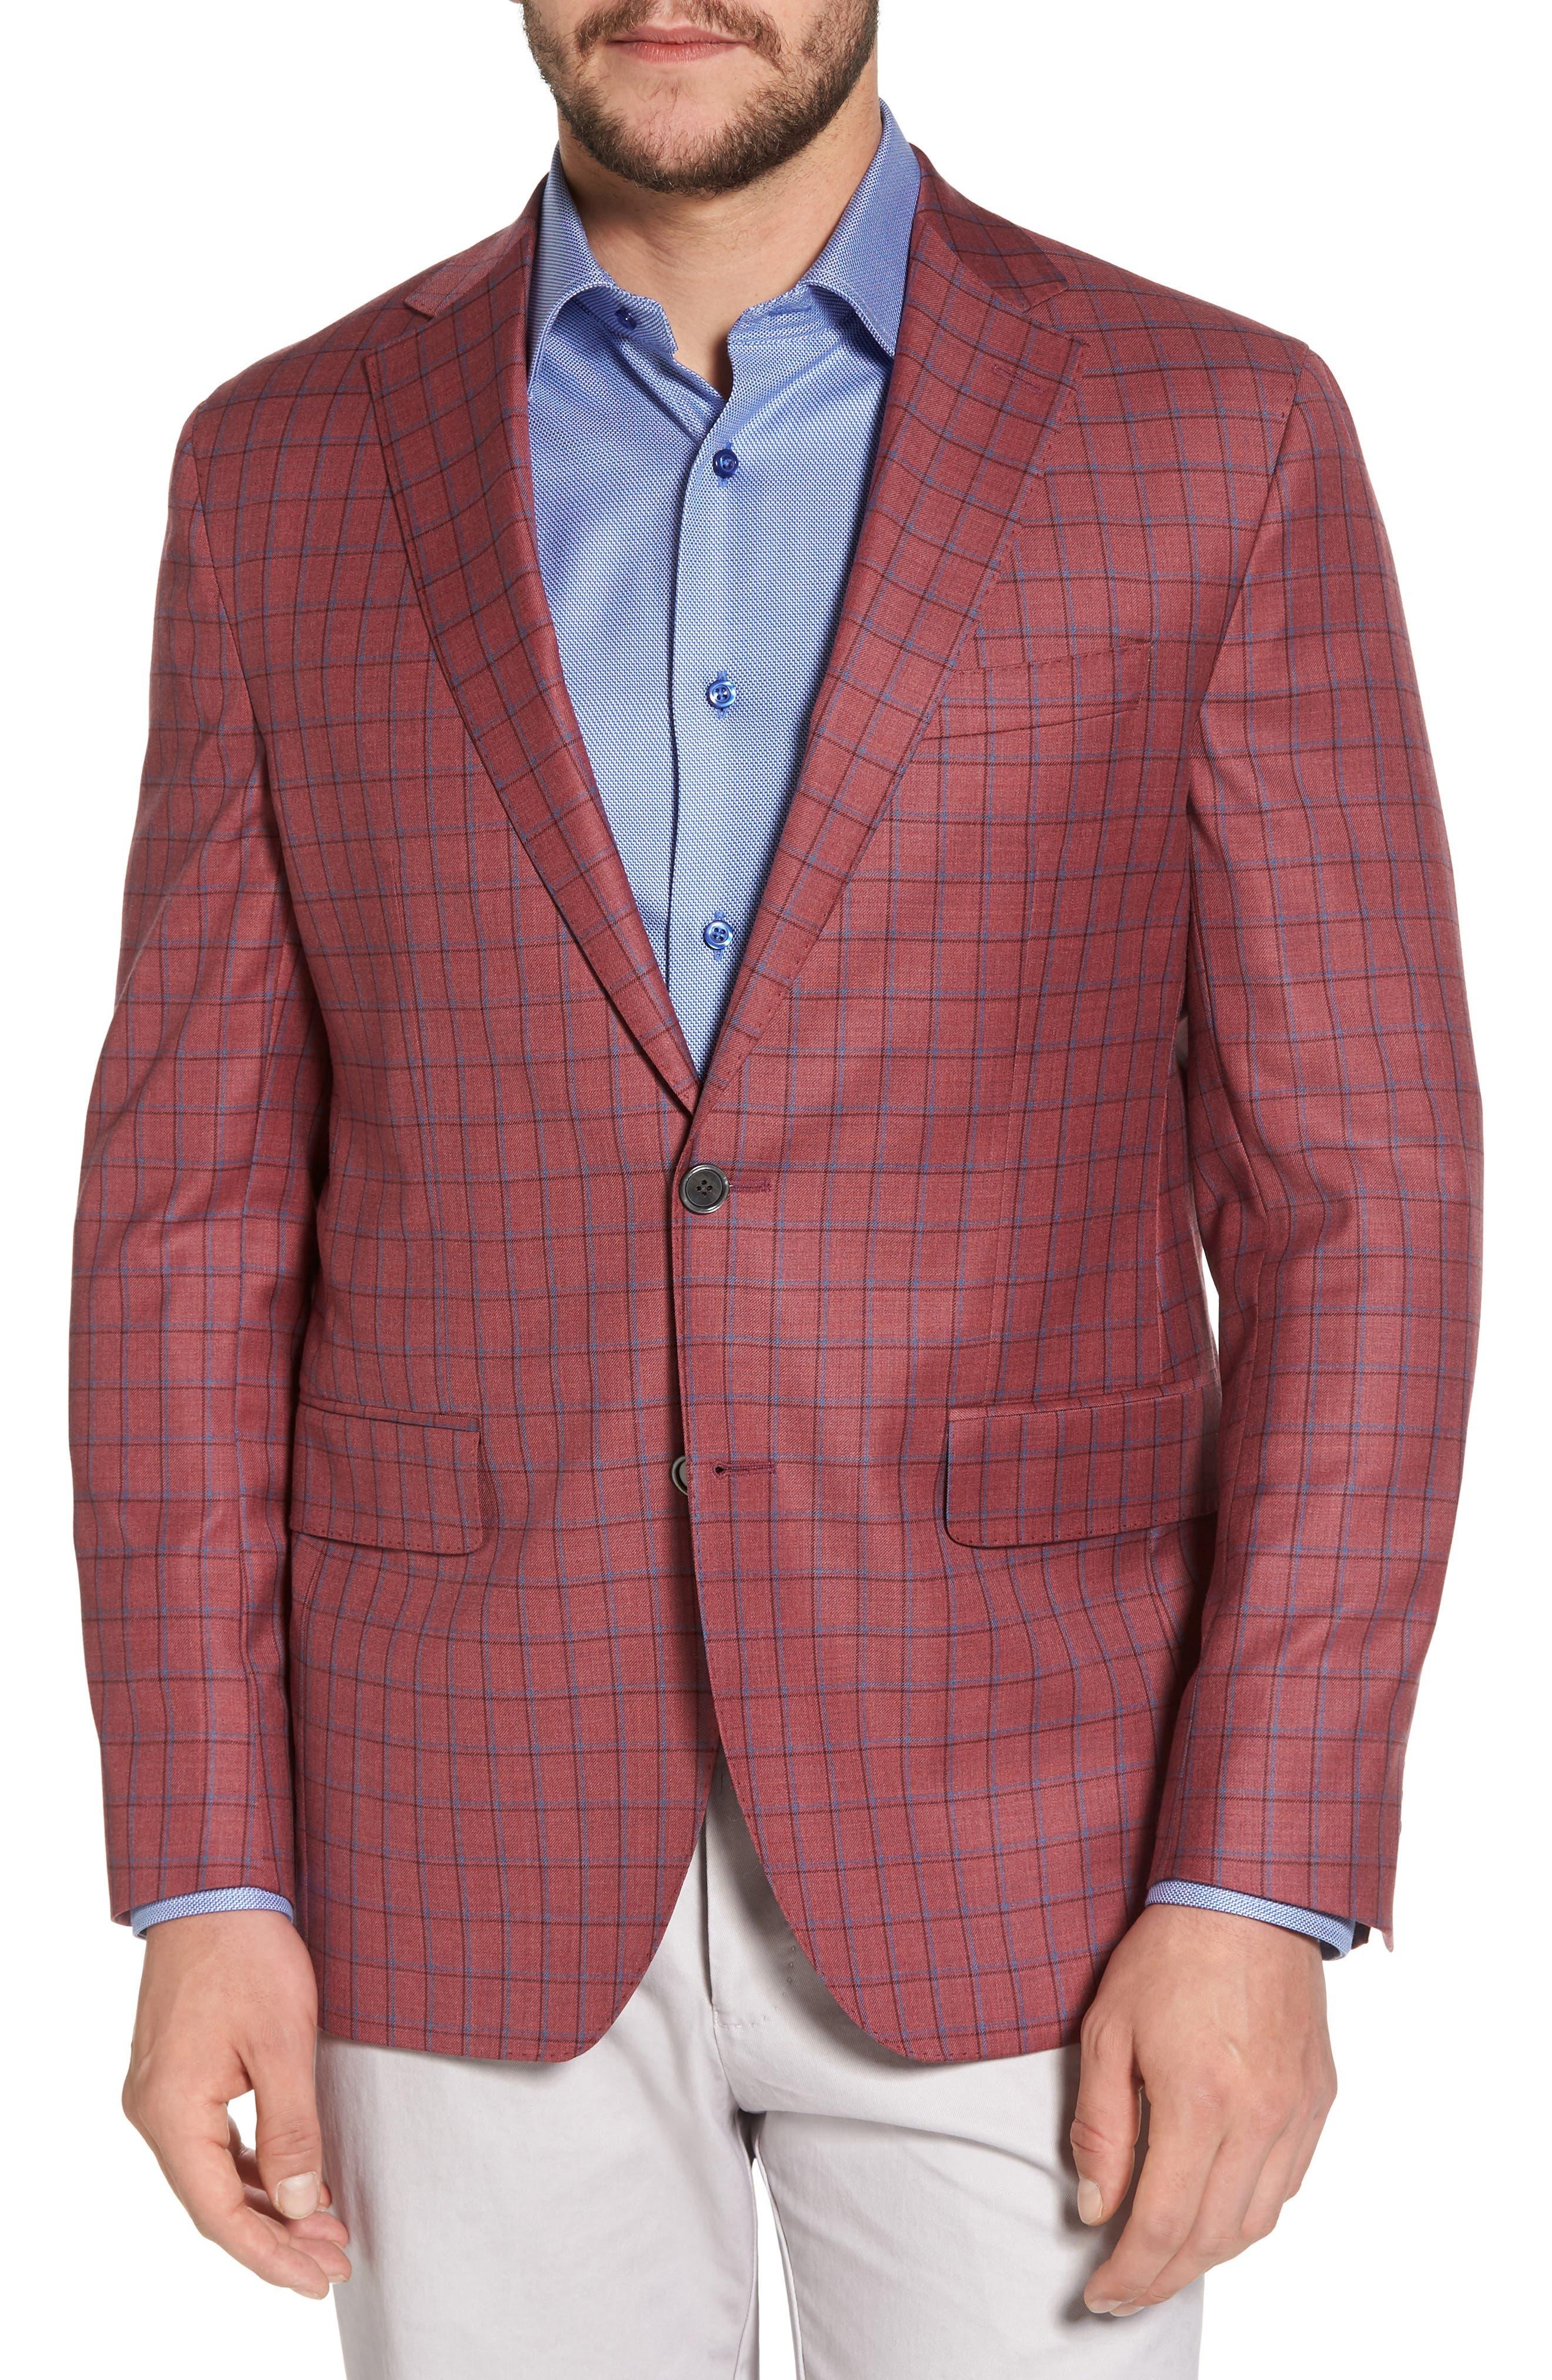 Main Image - David Donahue Arnold Classic Fit Plaid Wool Sport Coat